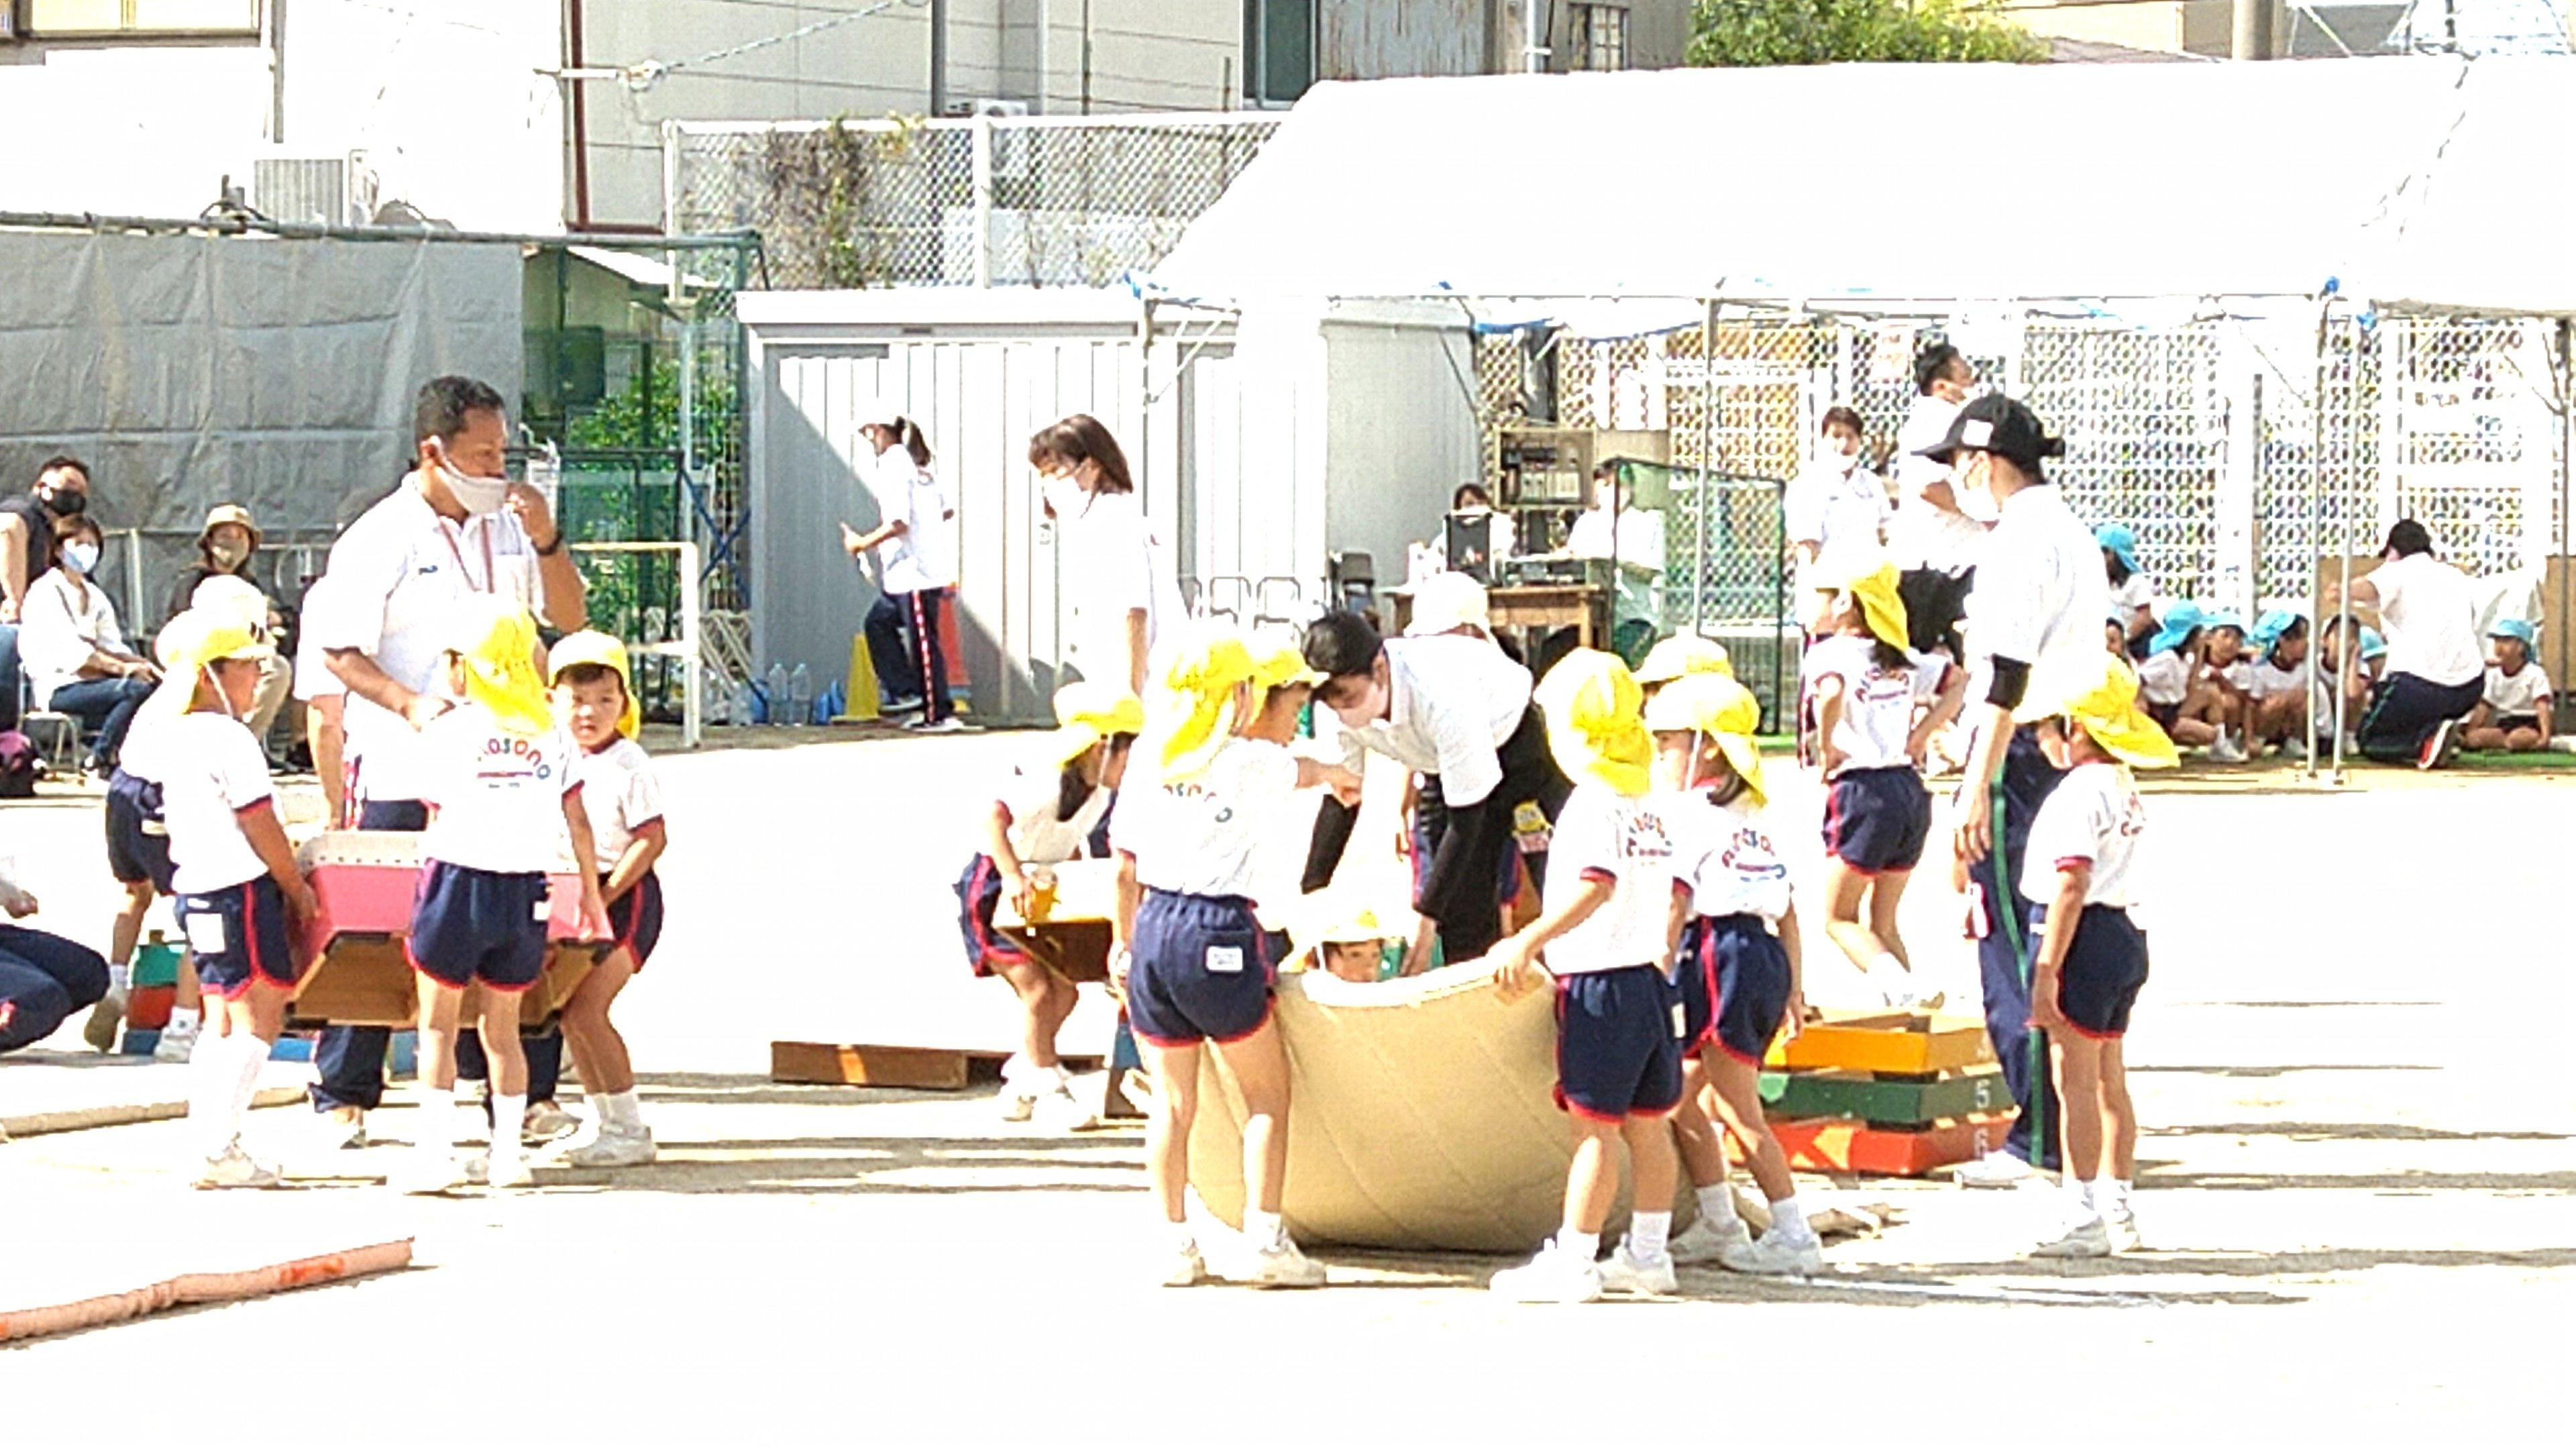 DSC_0302[1].JPG